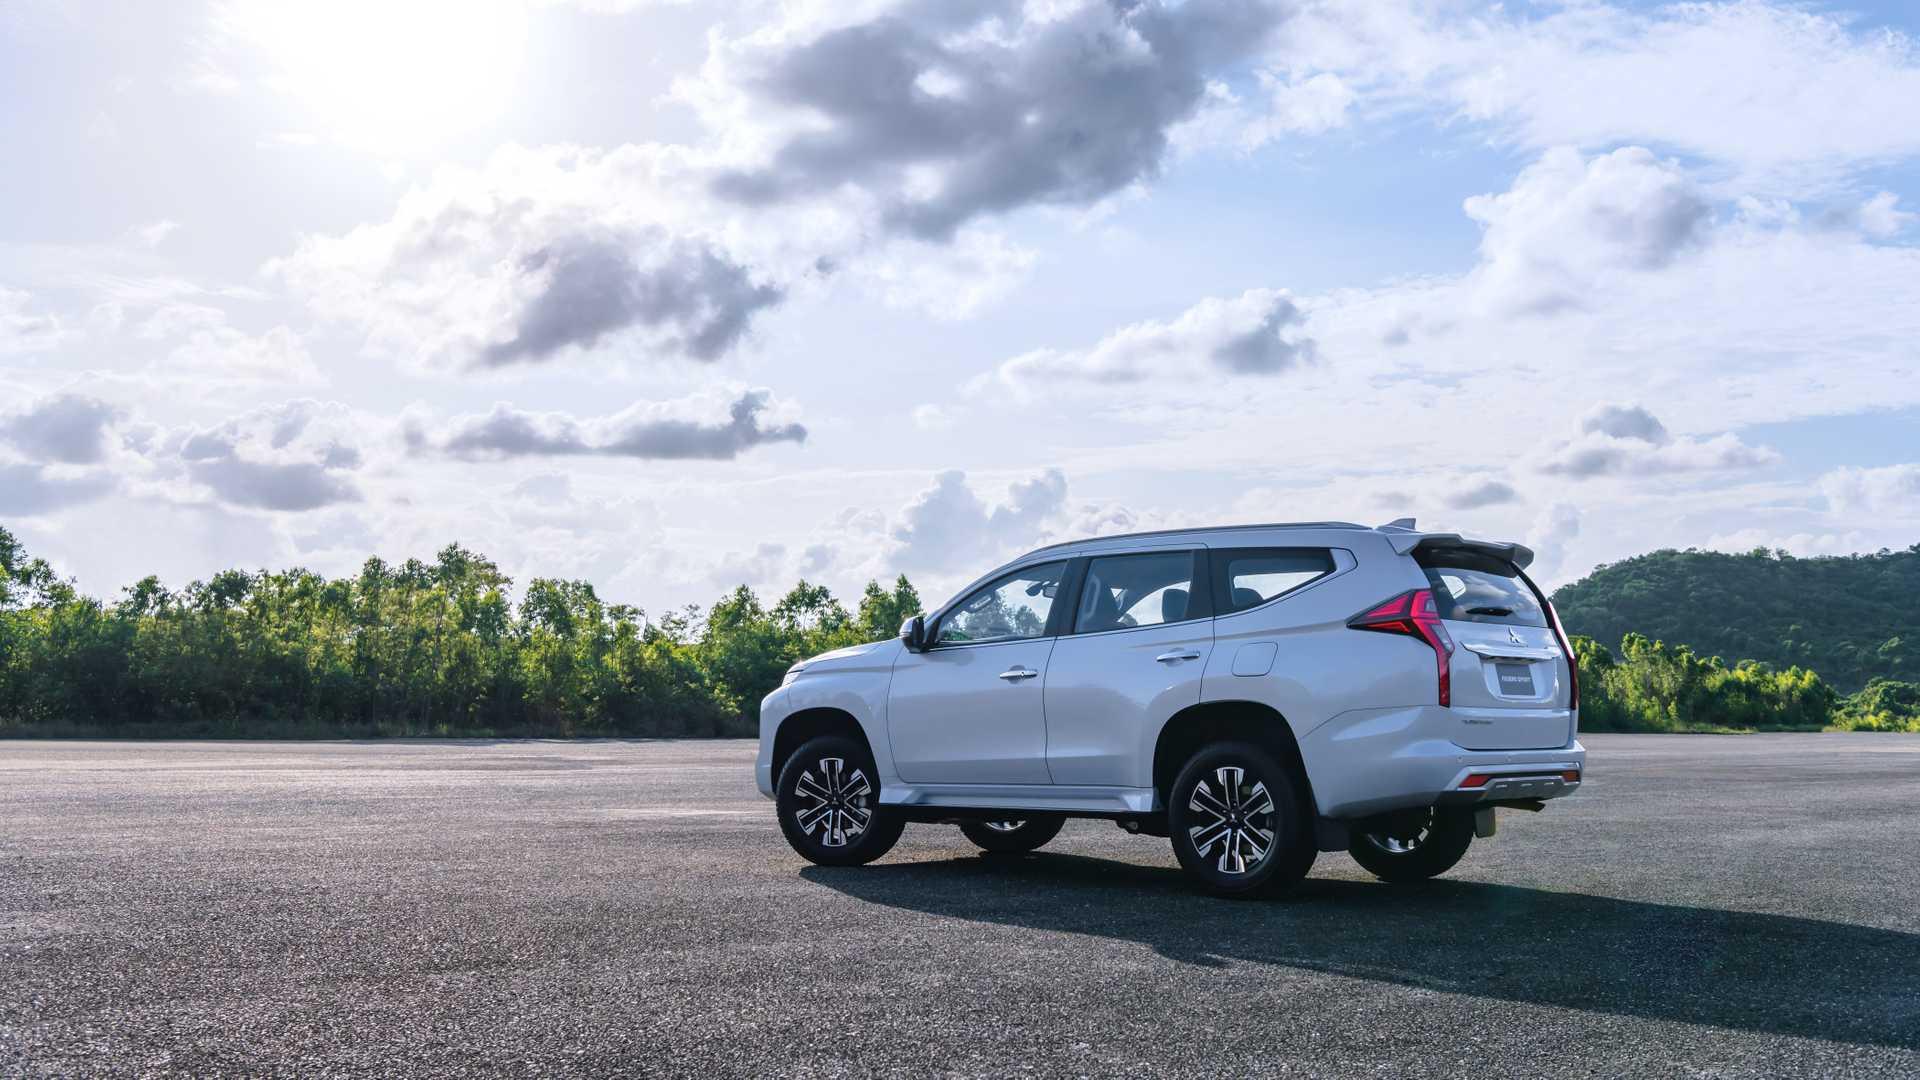 2020_Mitsubishi_Pajero_Sport_facelift_0021